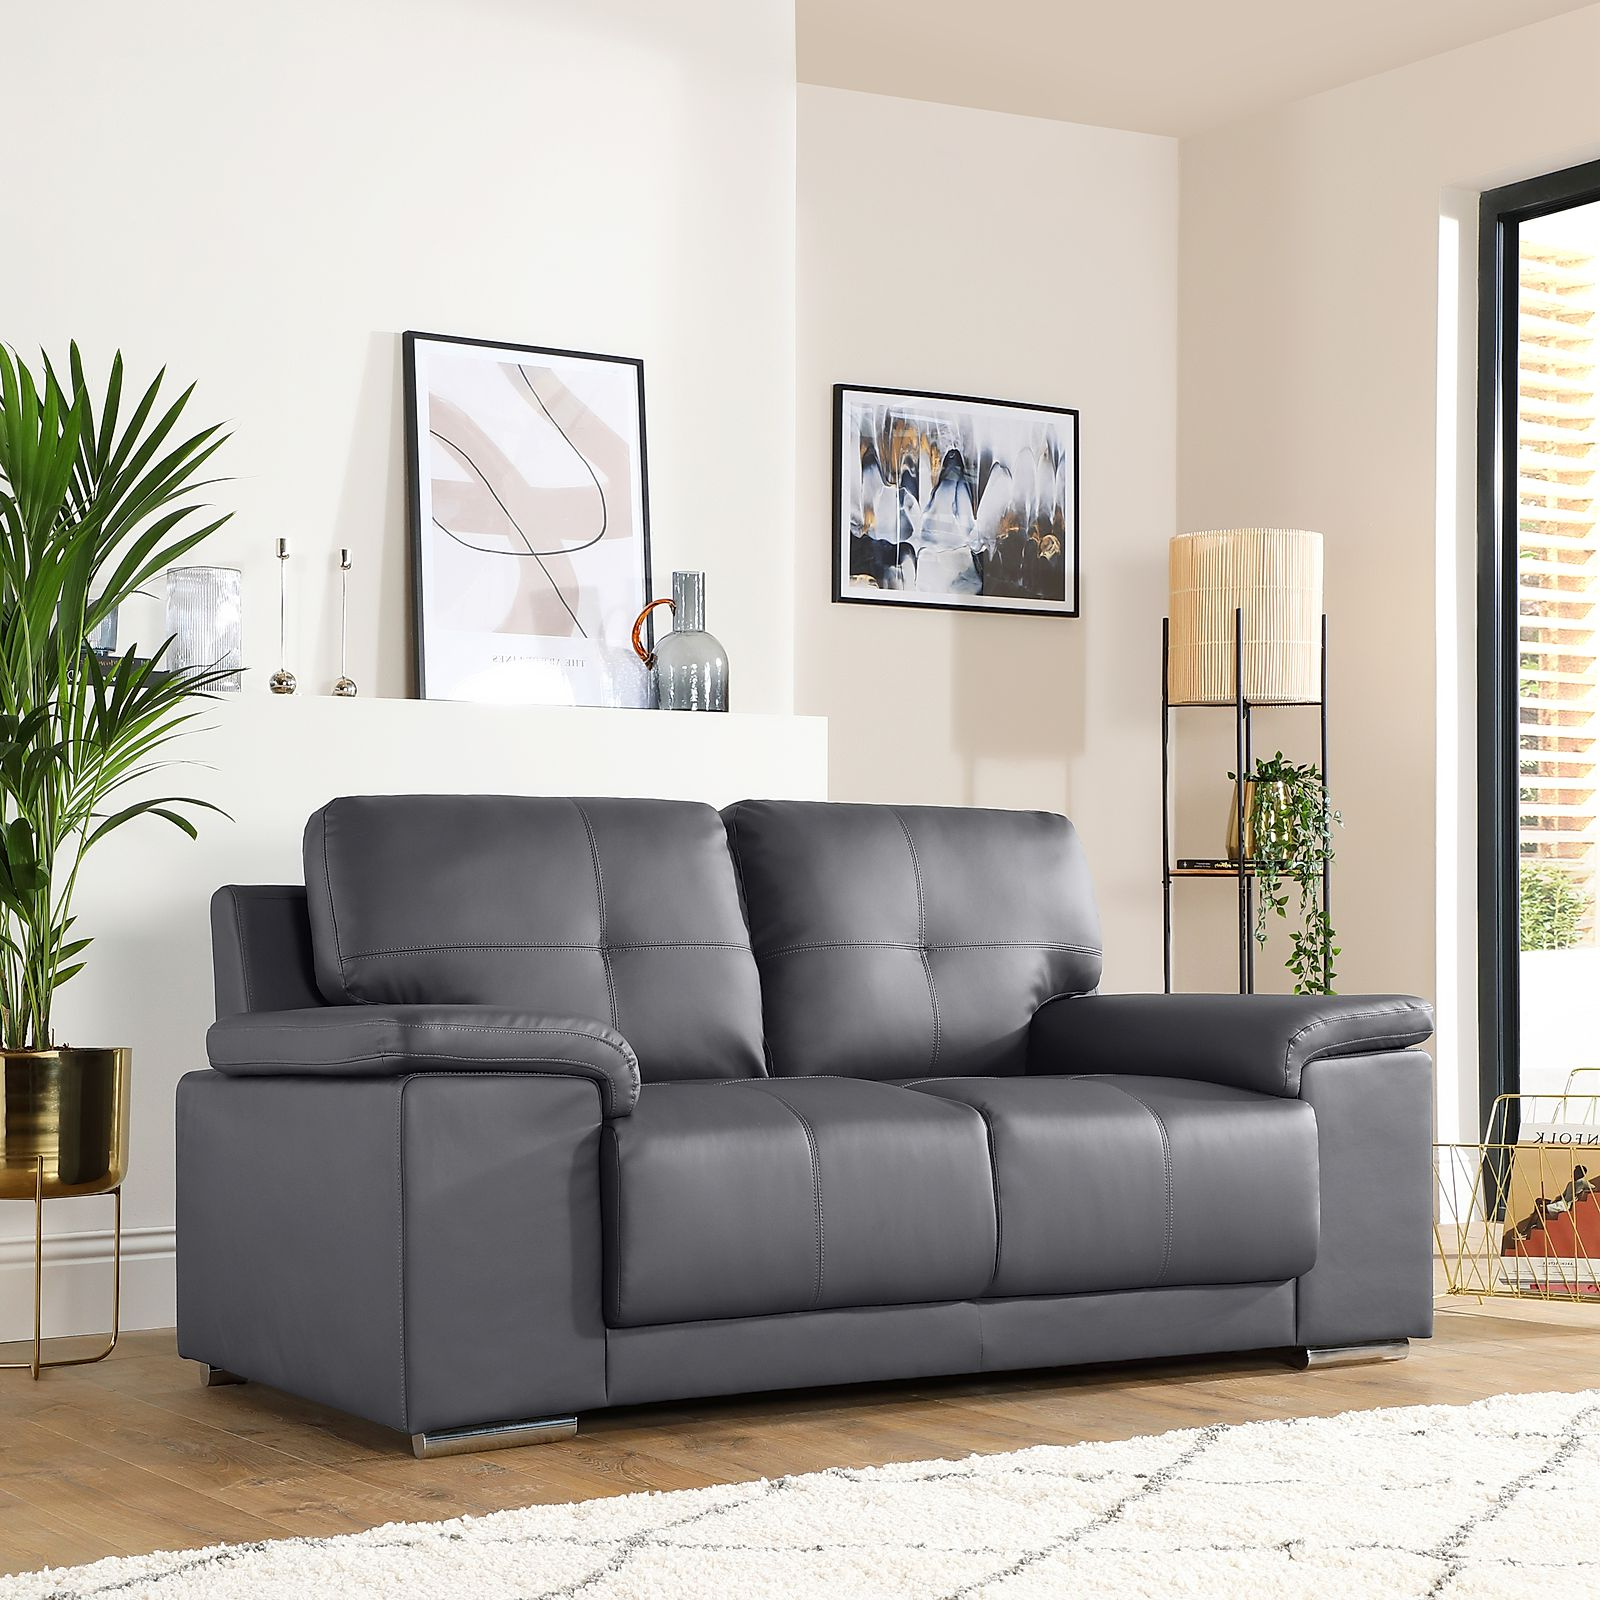 Gray Sofas For Famous Kansas Grey Leather 2 Seater Sofa (View 9 of 15)